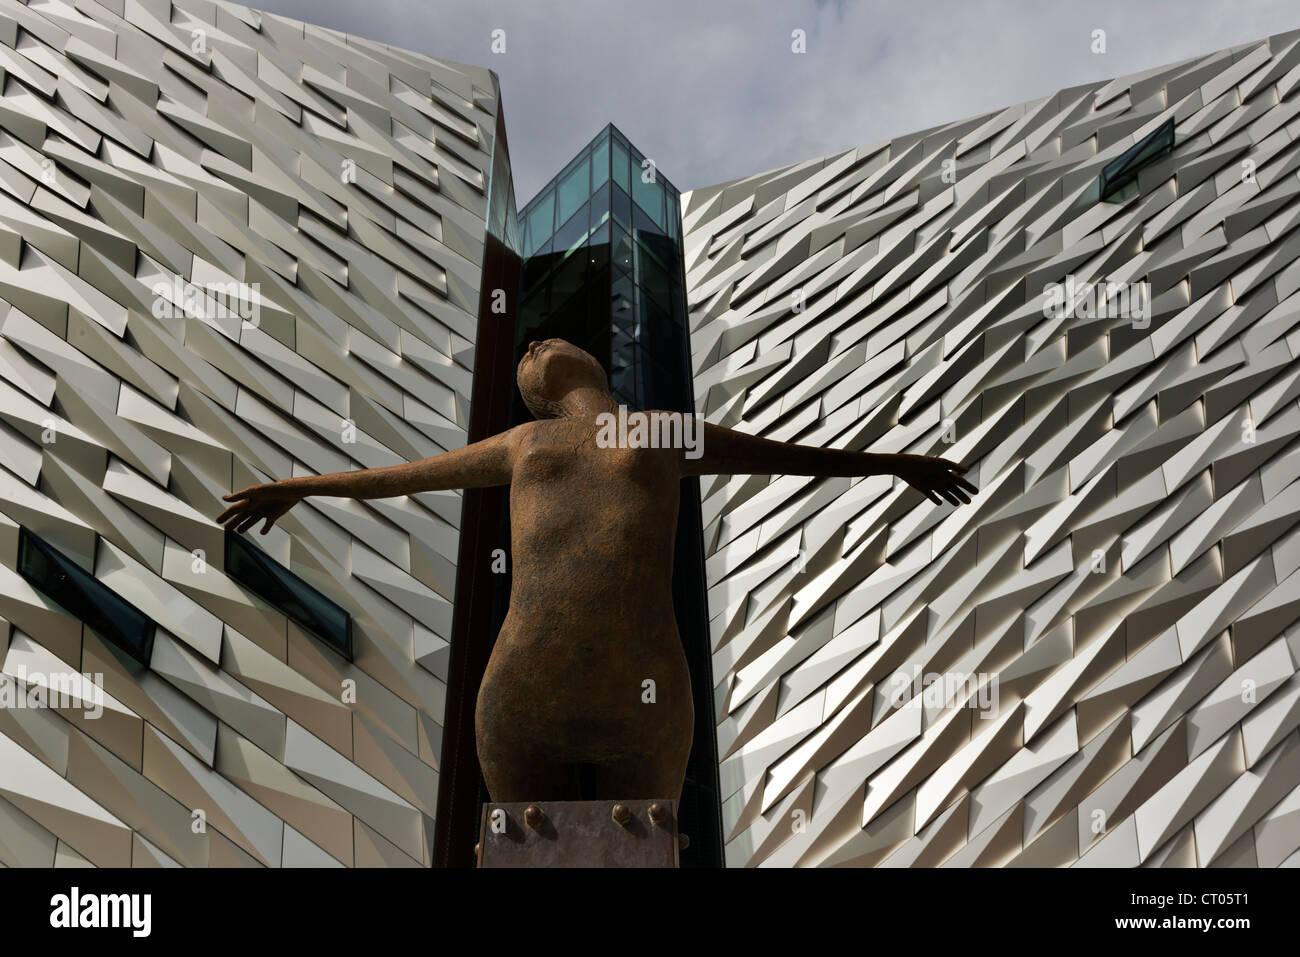 Rowan Gillespie's sculpture Titanica. Titanic Museum. Belfast. Northern Ireland. UK. Europe - Stock Image